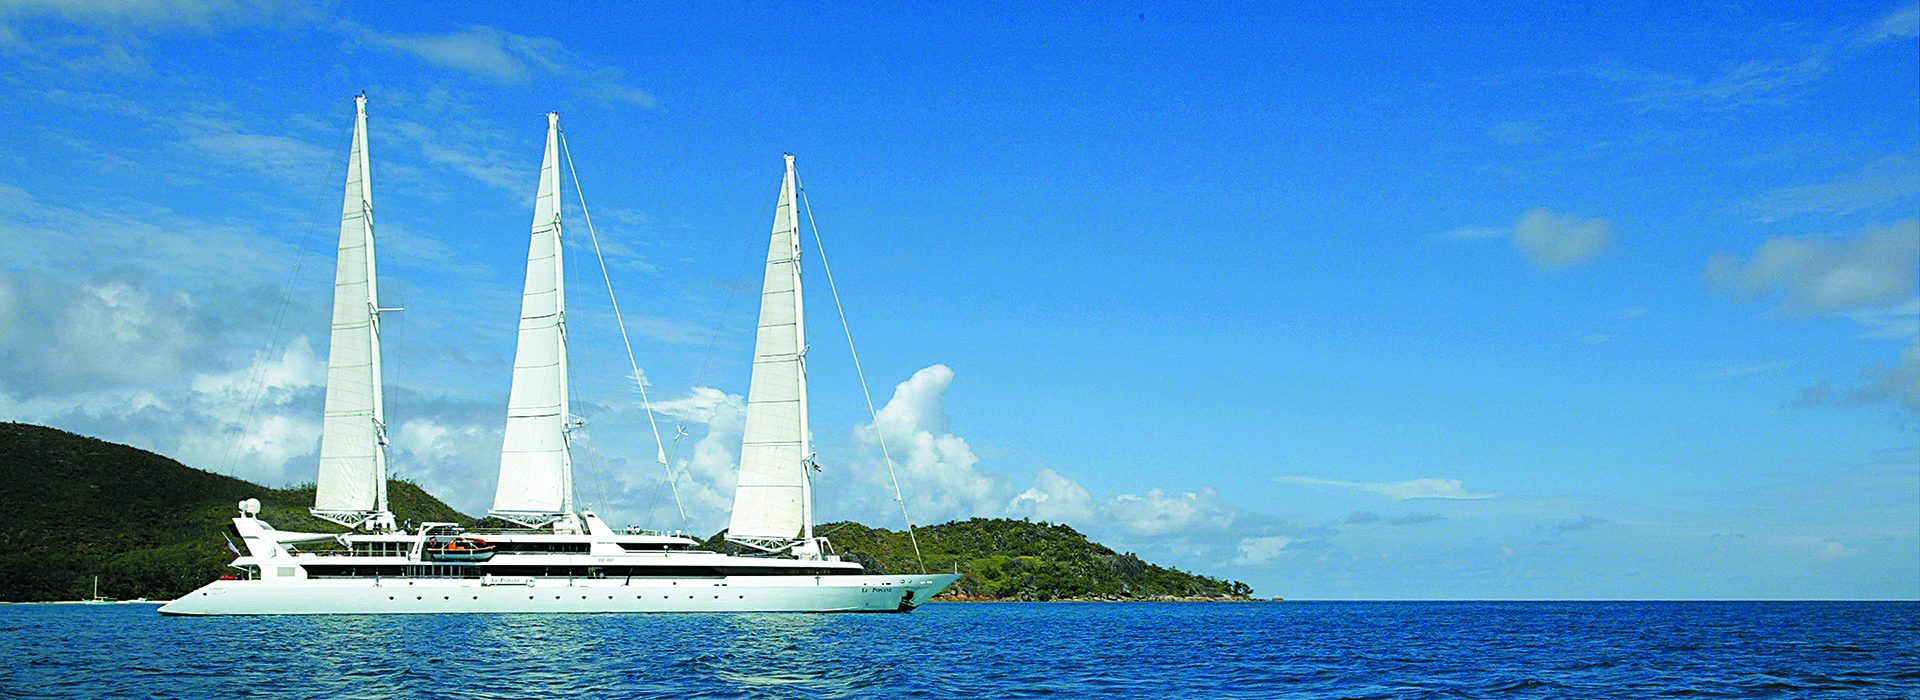 Le Ponant Segelschiff auf See